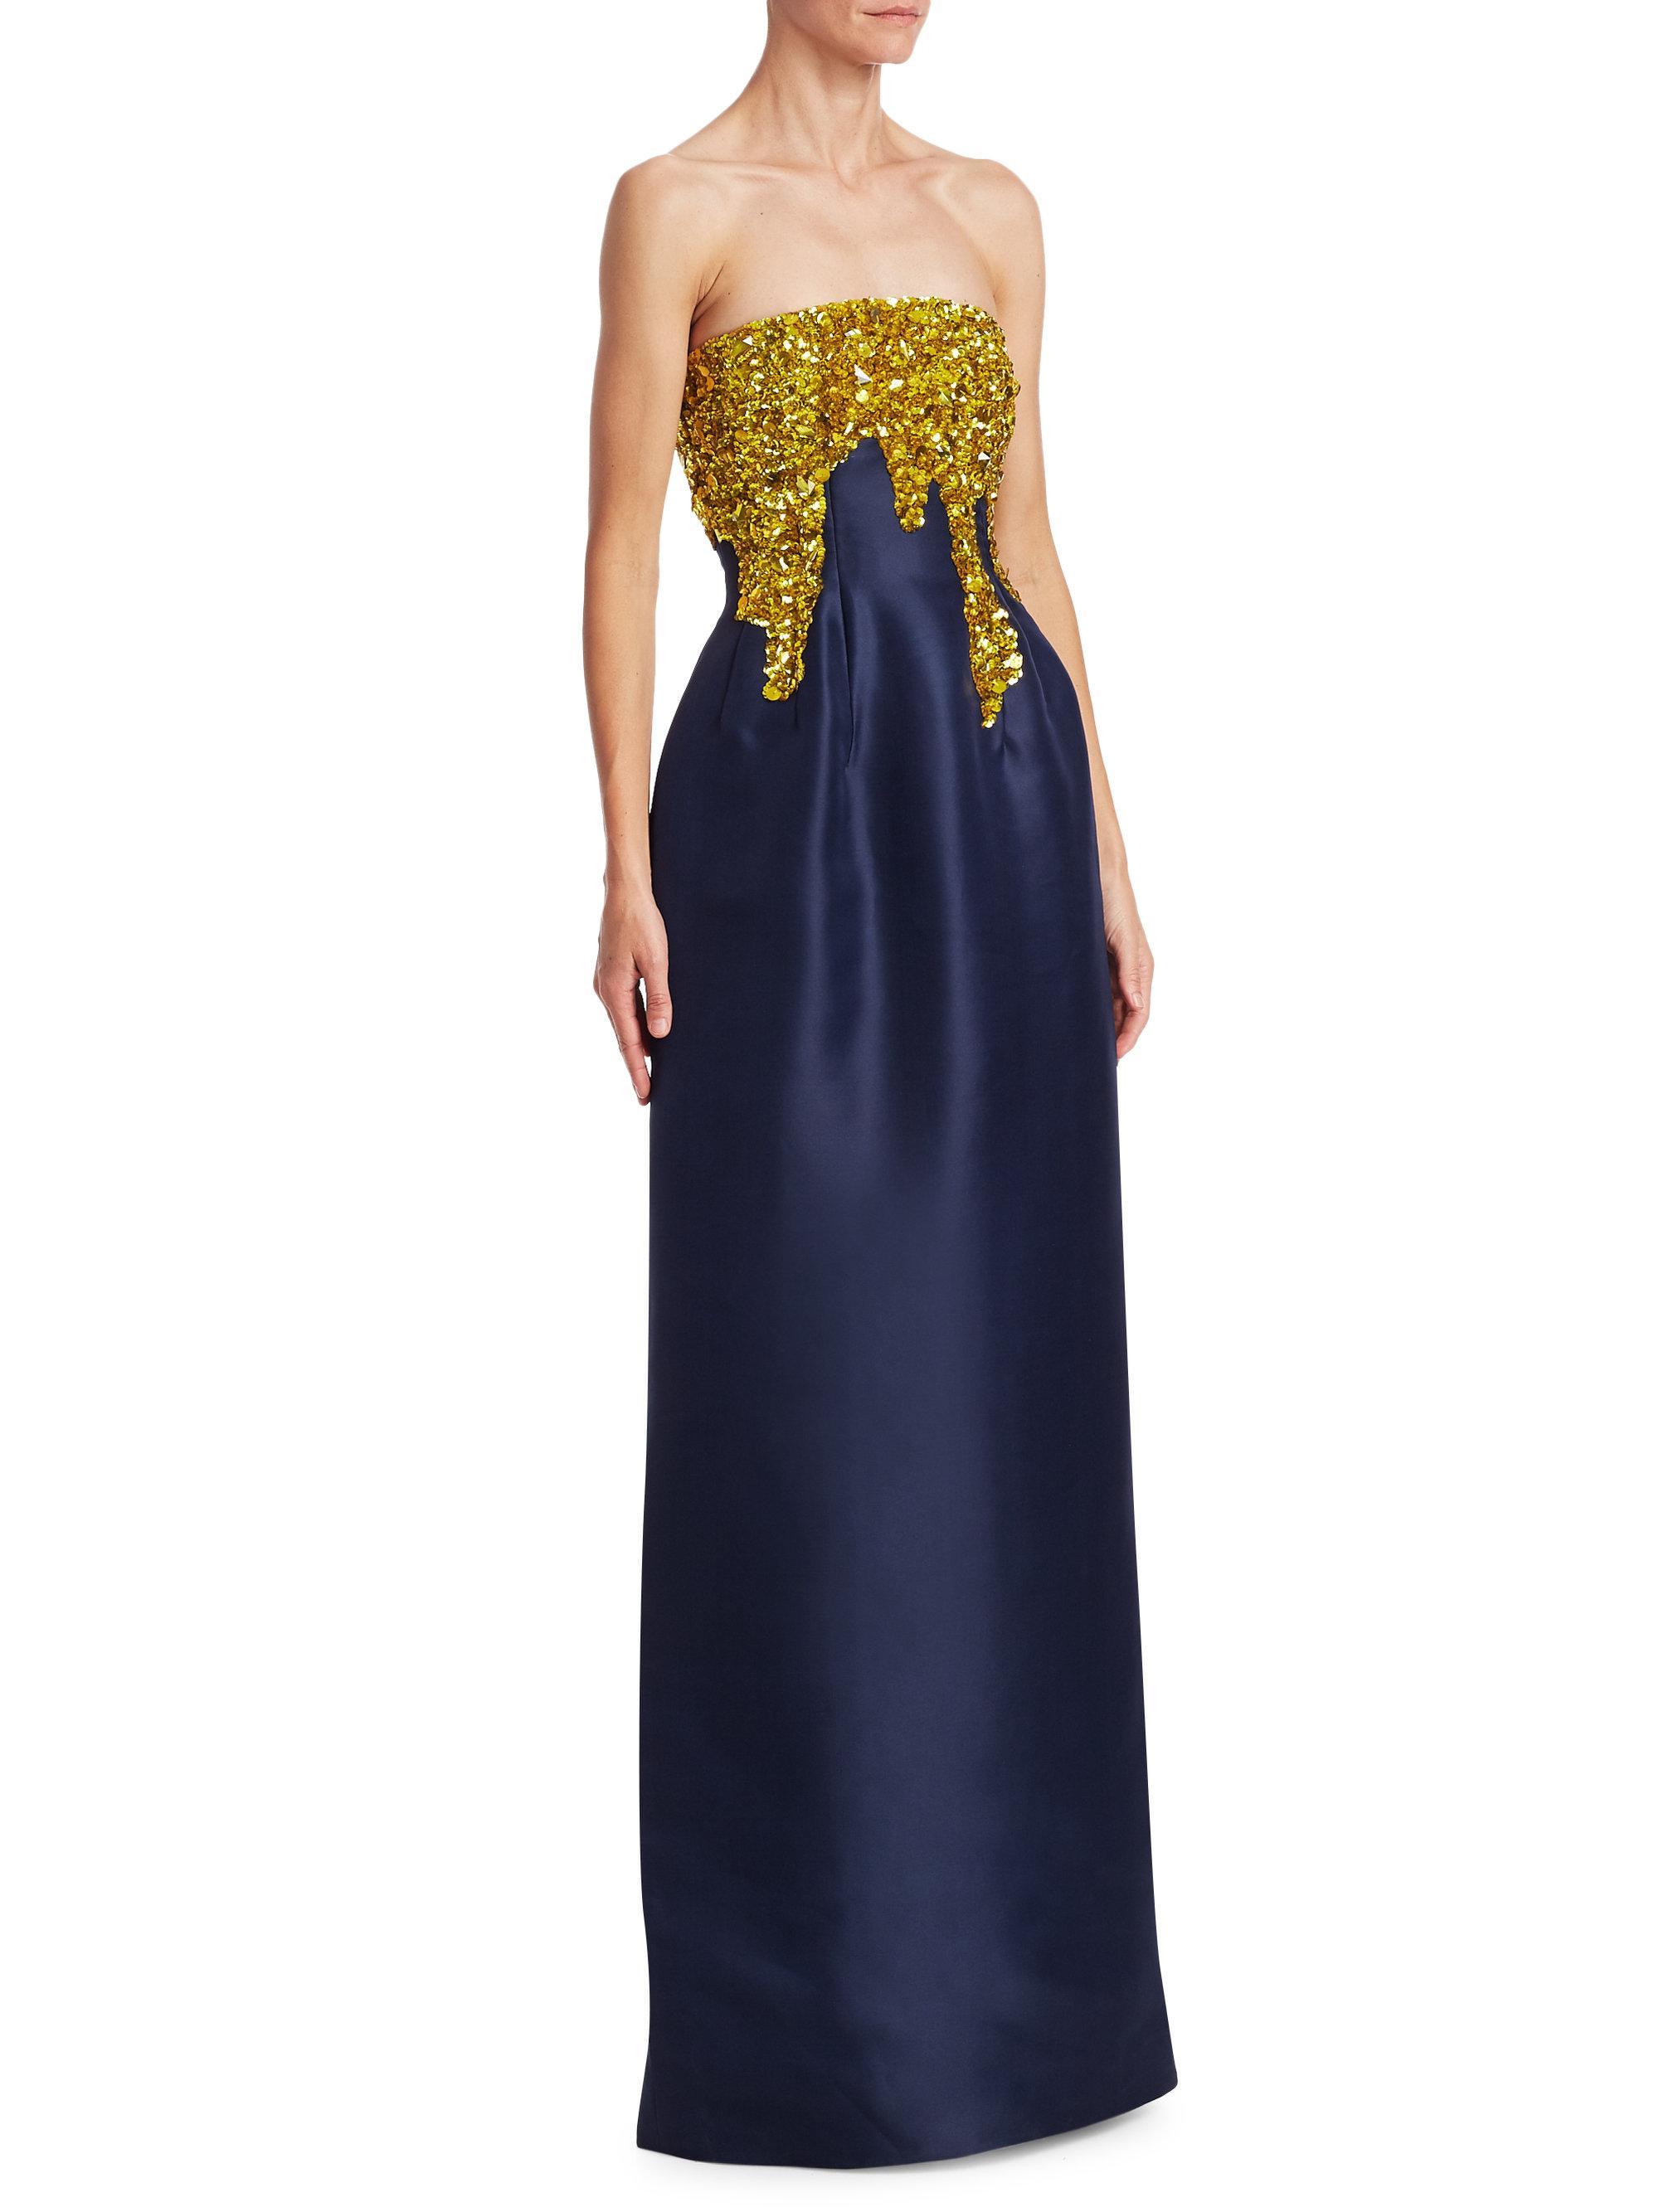 840d7c3063e49 Oscar de la Renta Strapless Silk Column Gown in Blue - Lyst